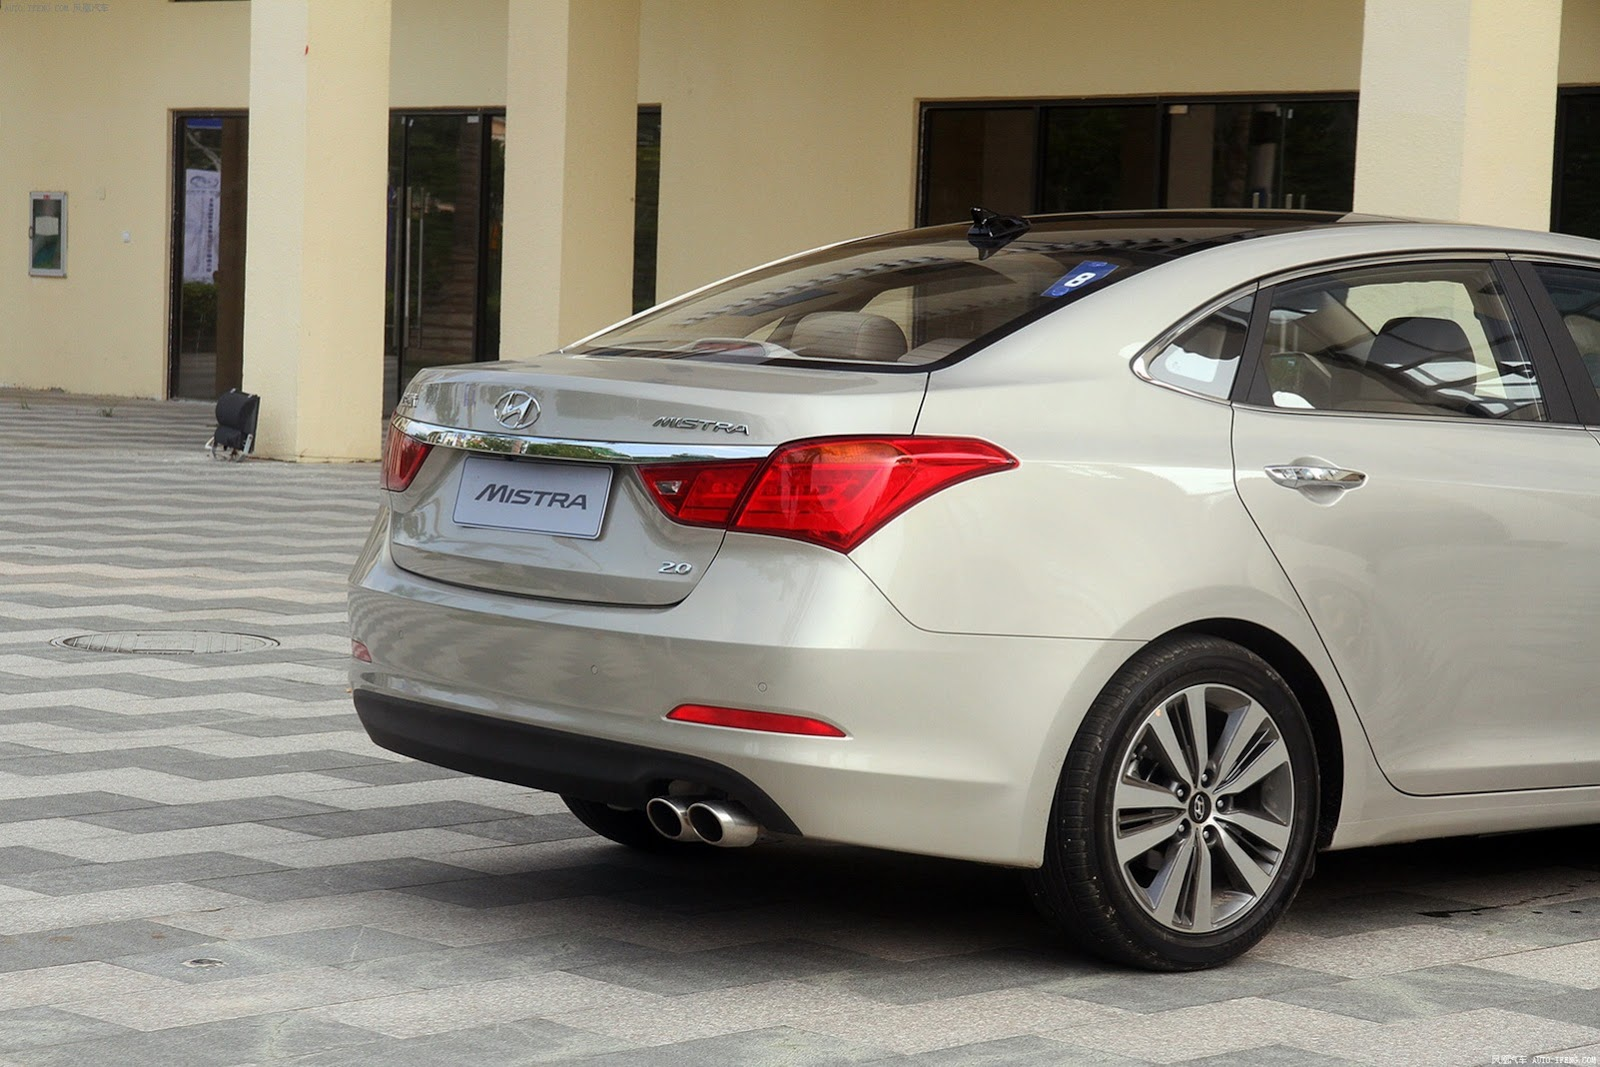 Hyundai Mistra on 2018 Hyundai Elantra